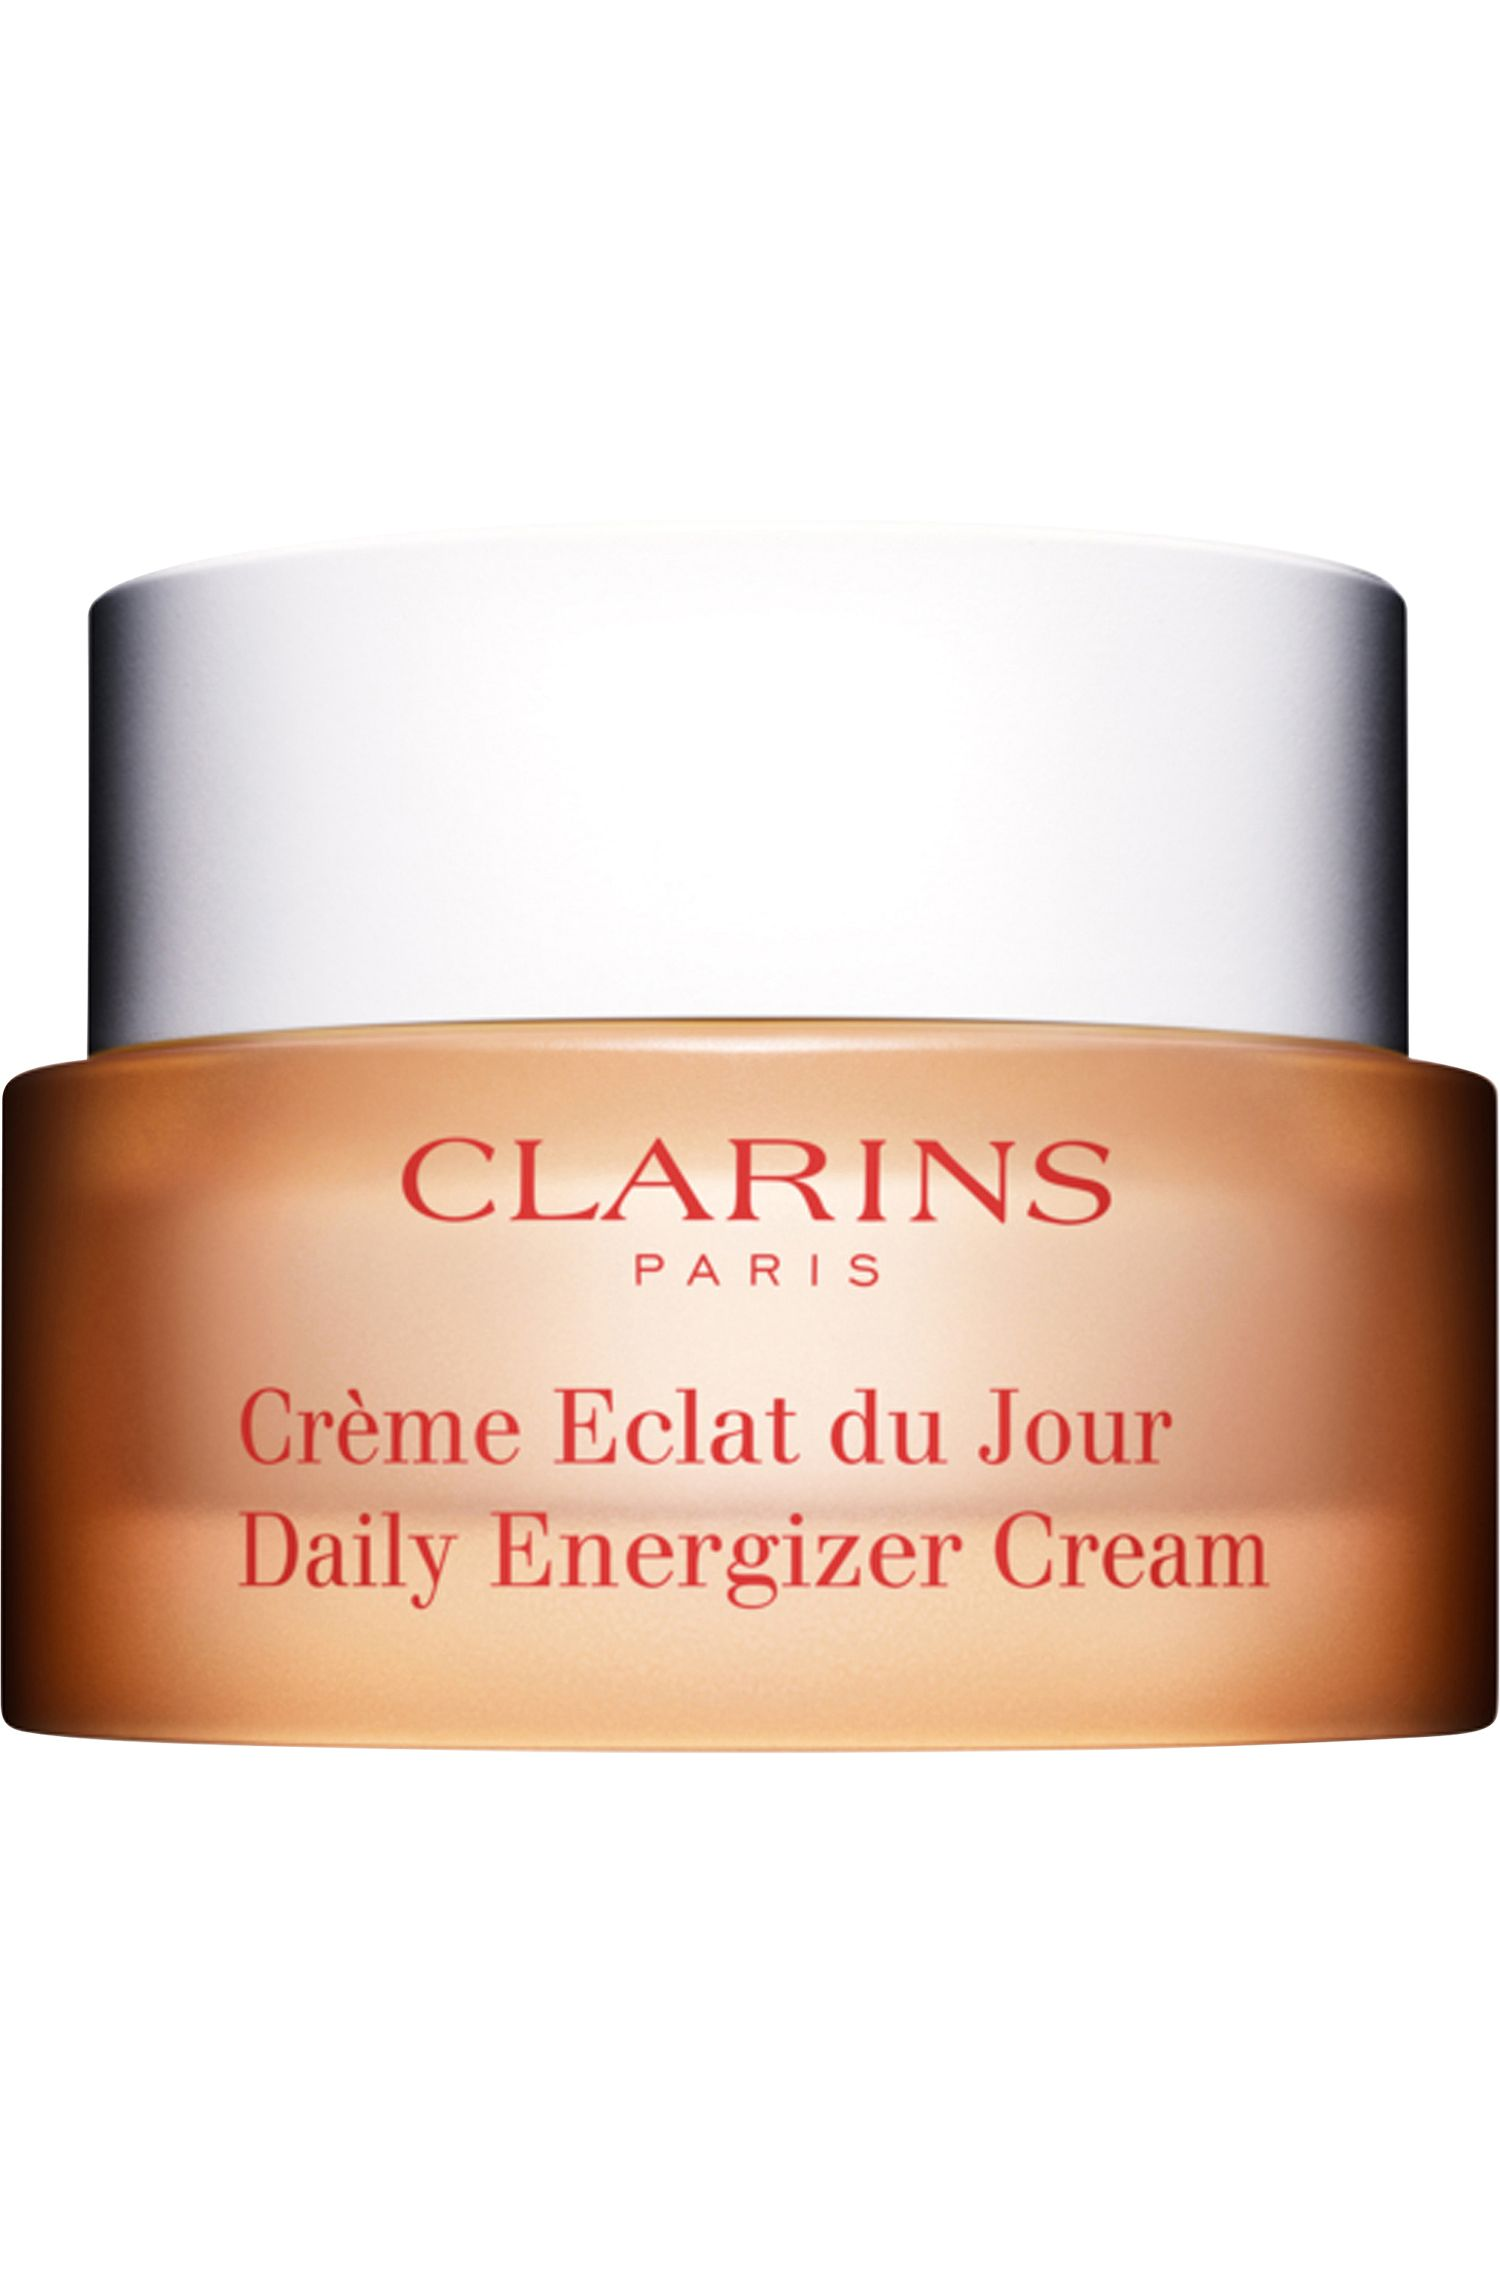 Blissim : Clarins - Crème hydratante Eclat du Jour - Crème hydratante Eclat du Jour